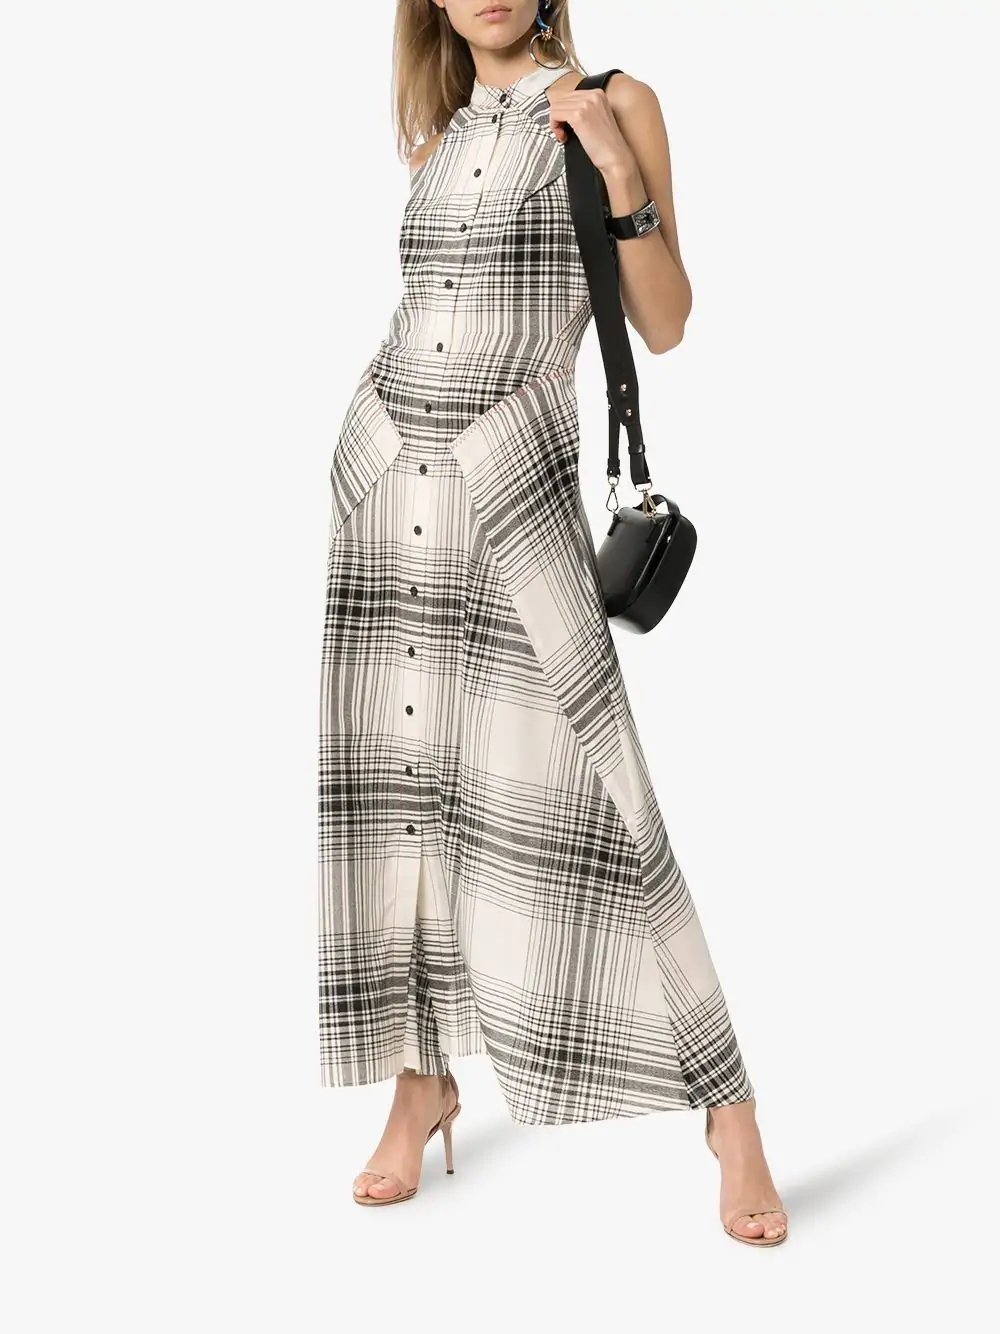 ffb0ecb2d8e Roland Mouret Amador Check Print Silk-Blend Dress In C4024 Monochrome